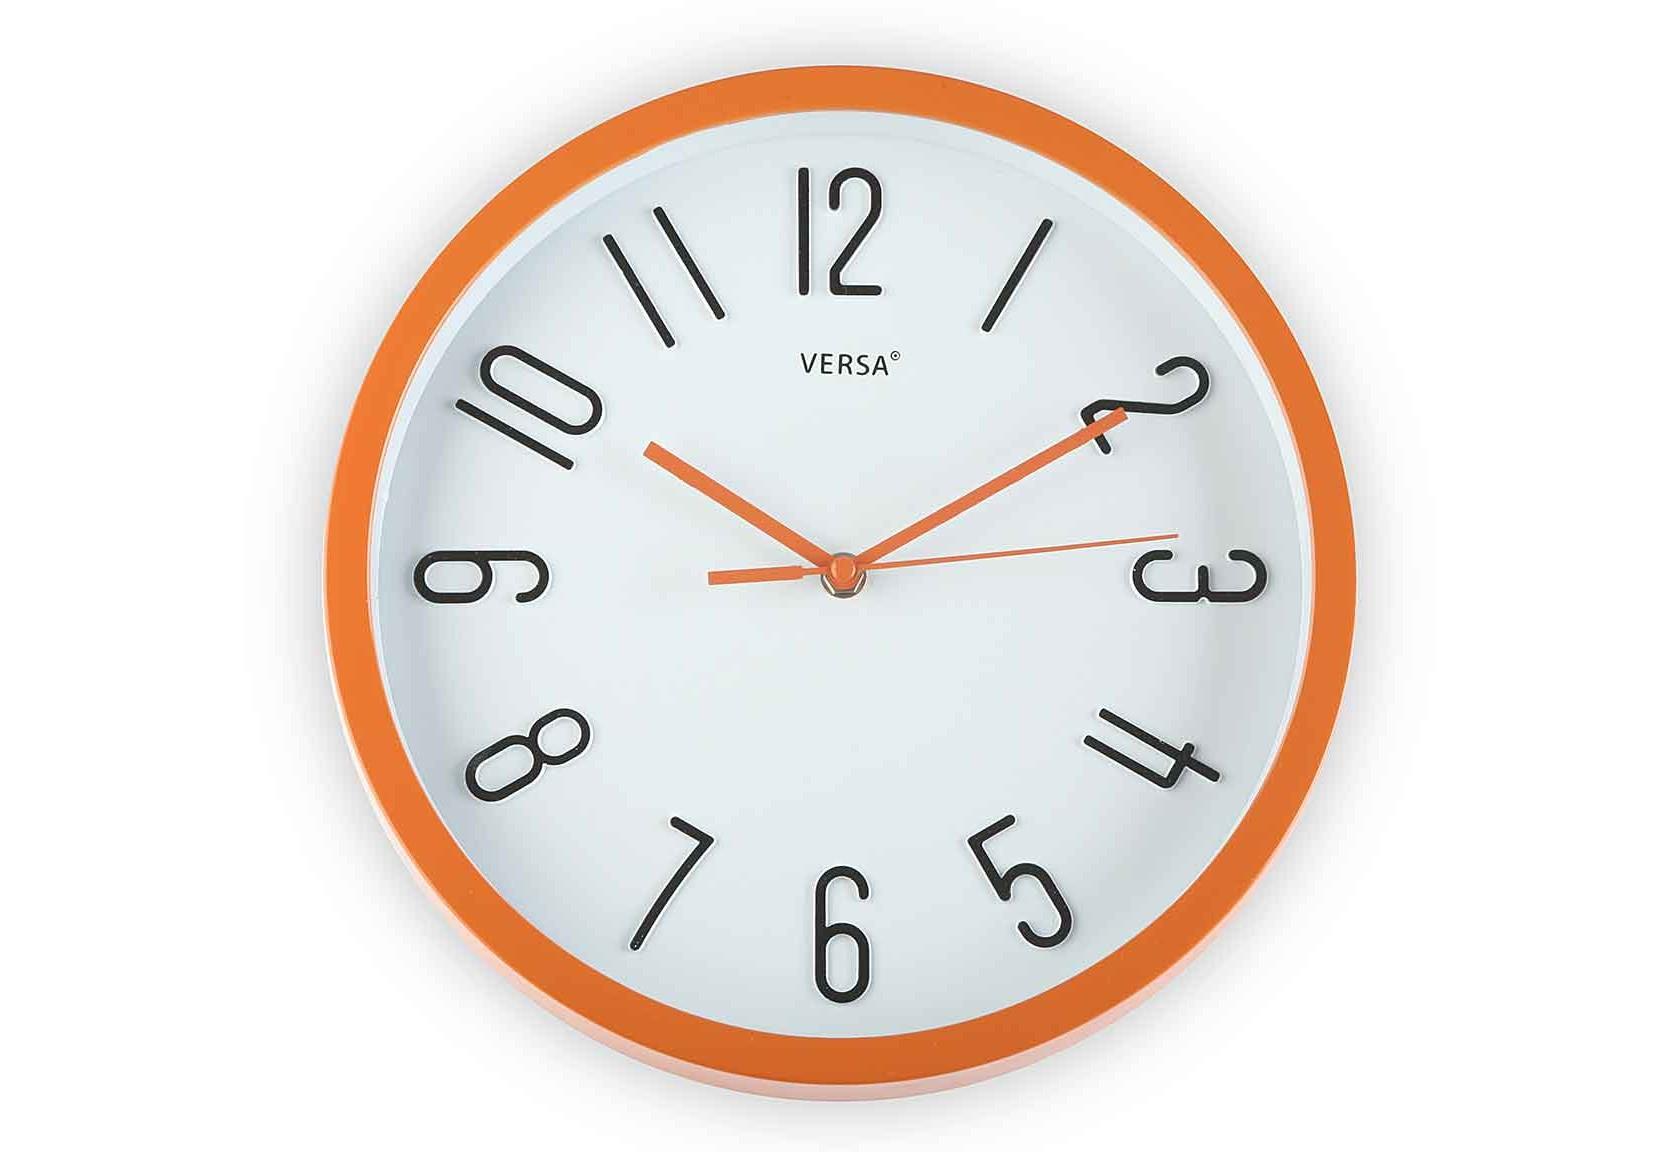 Настенные часыНастенные часы<br>Тип механизма: кварцевые.<br><br>Material: Пластик<br>Глубина см: 4.6